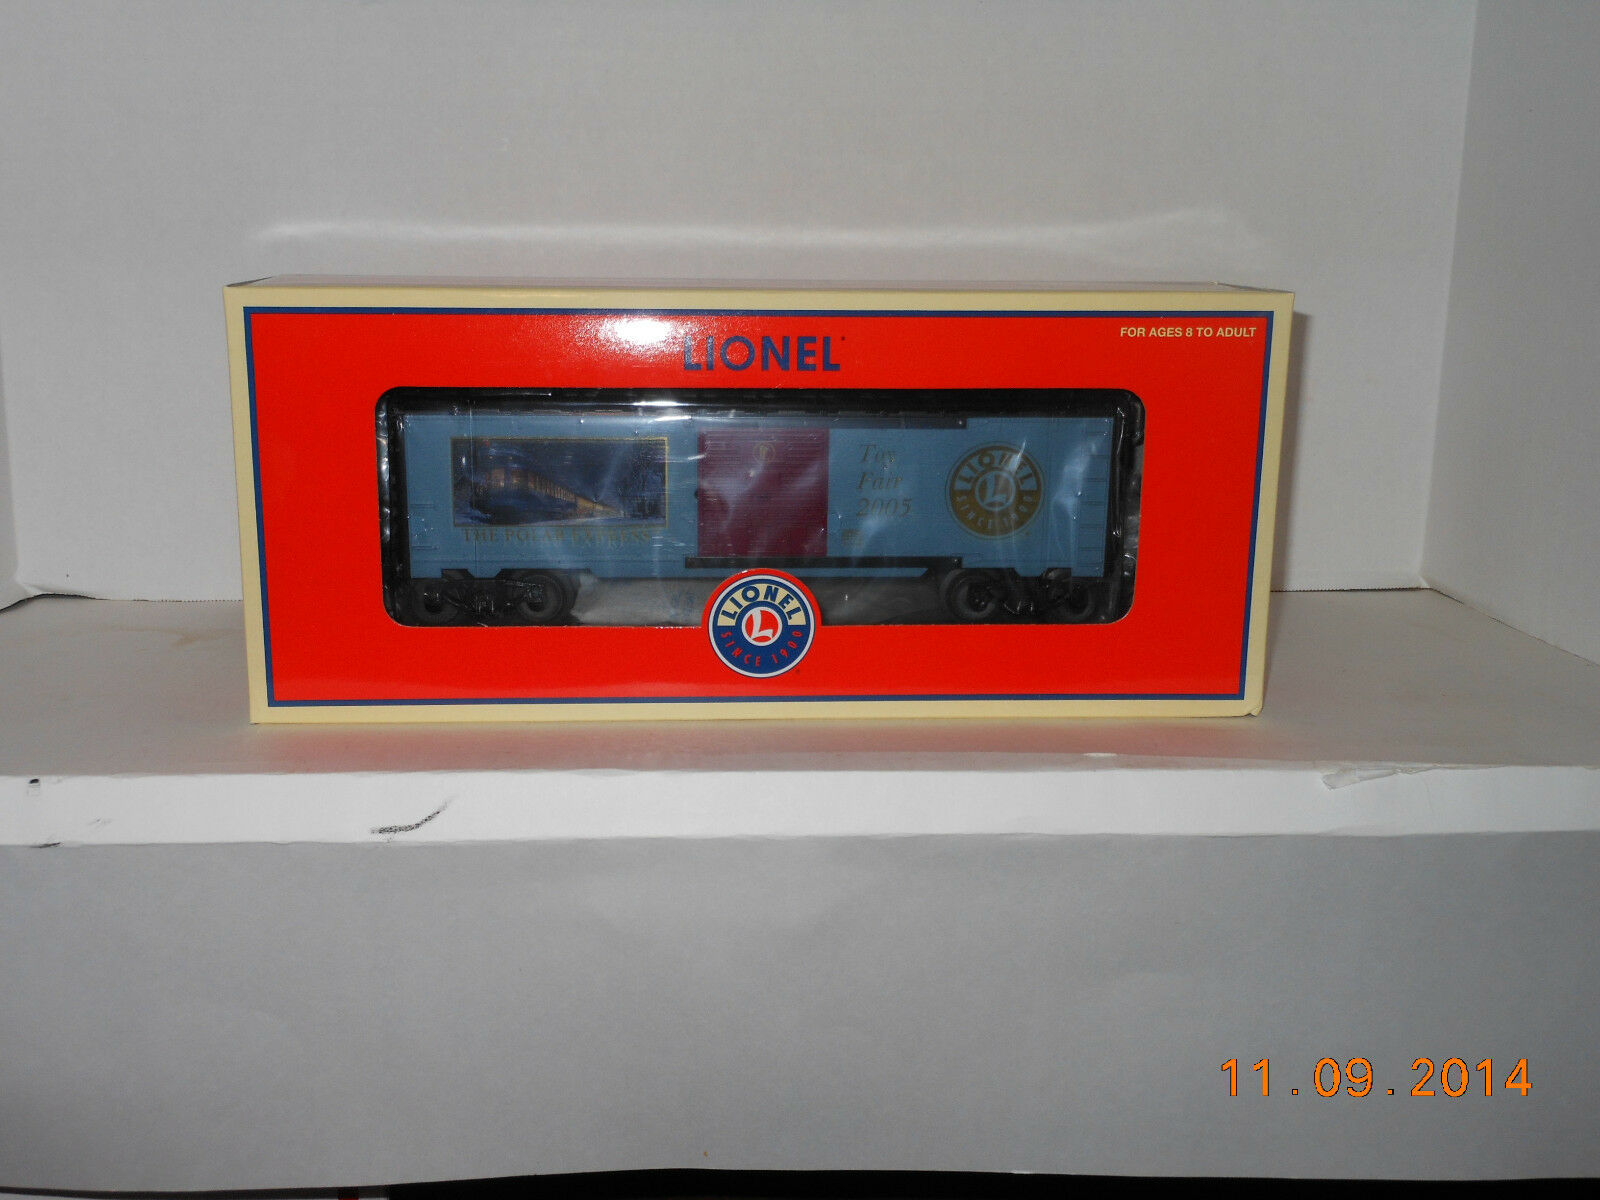 LIONEL polar express leksak fair lådabil